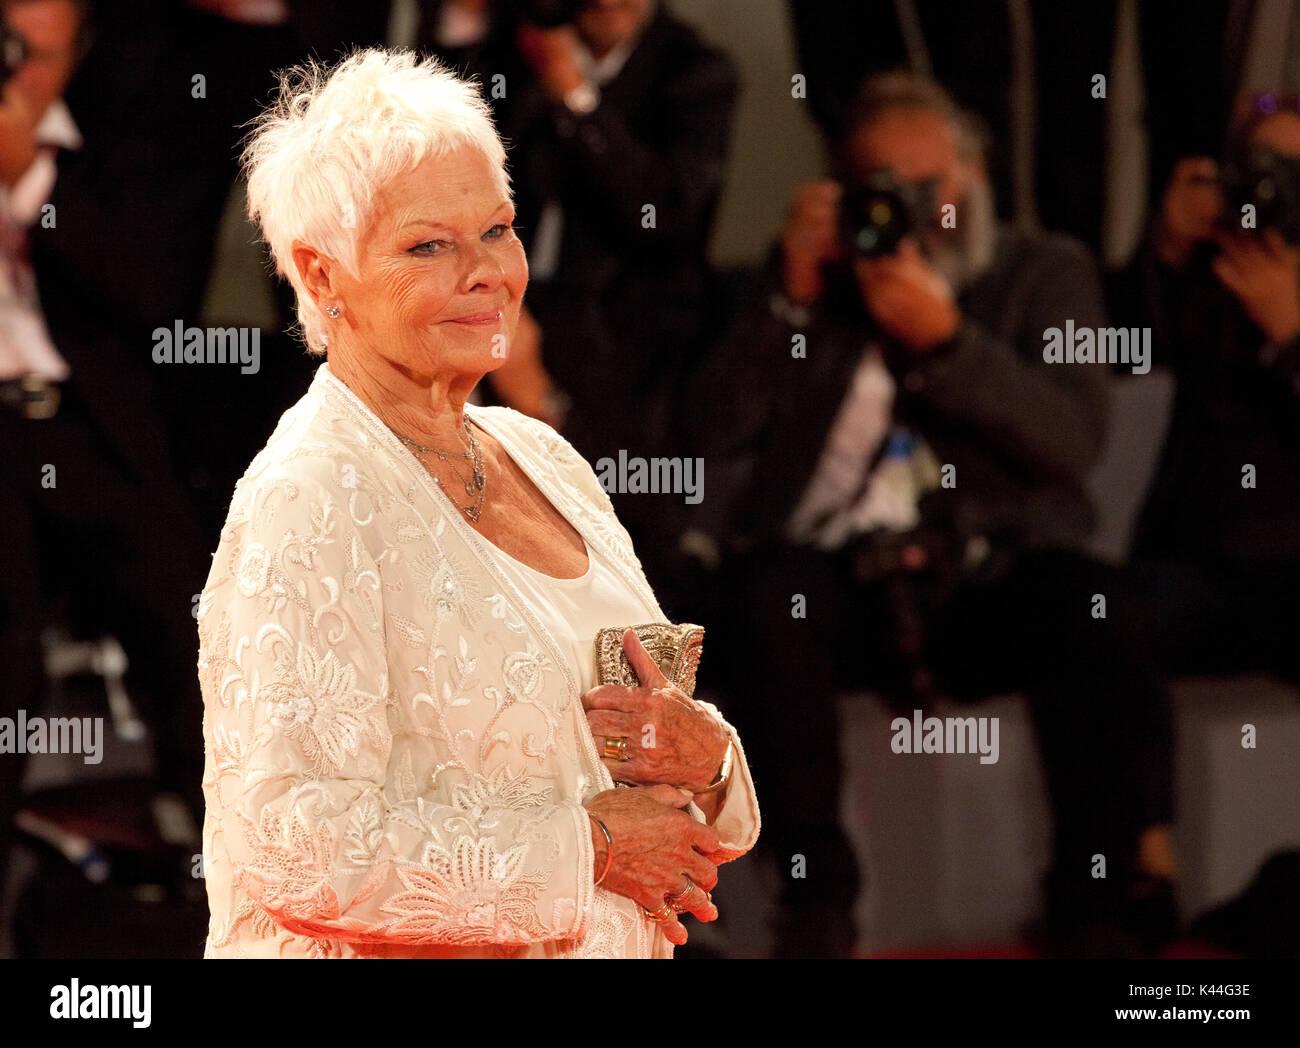 Judi Dench at the premiere of the film Victoria & Abdul at the 74th Venice Film Festival, Sala Grande on Sunday Stock Photo